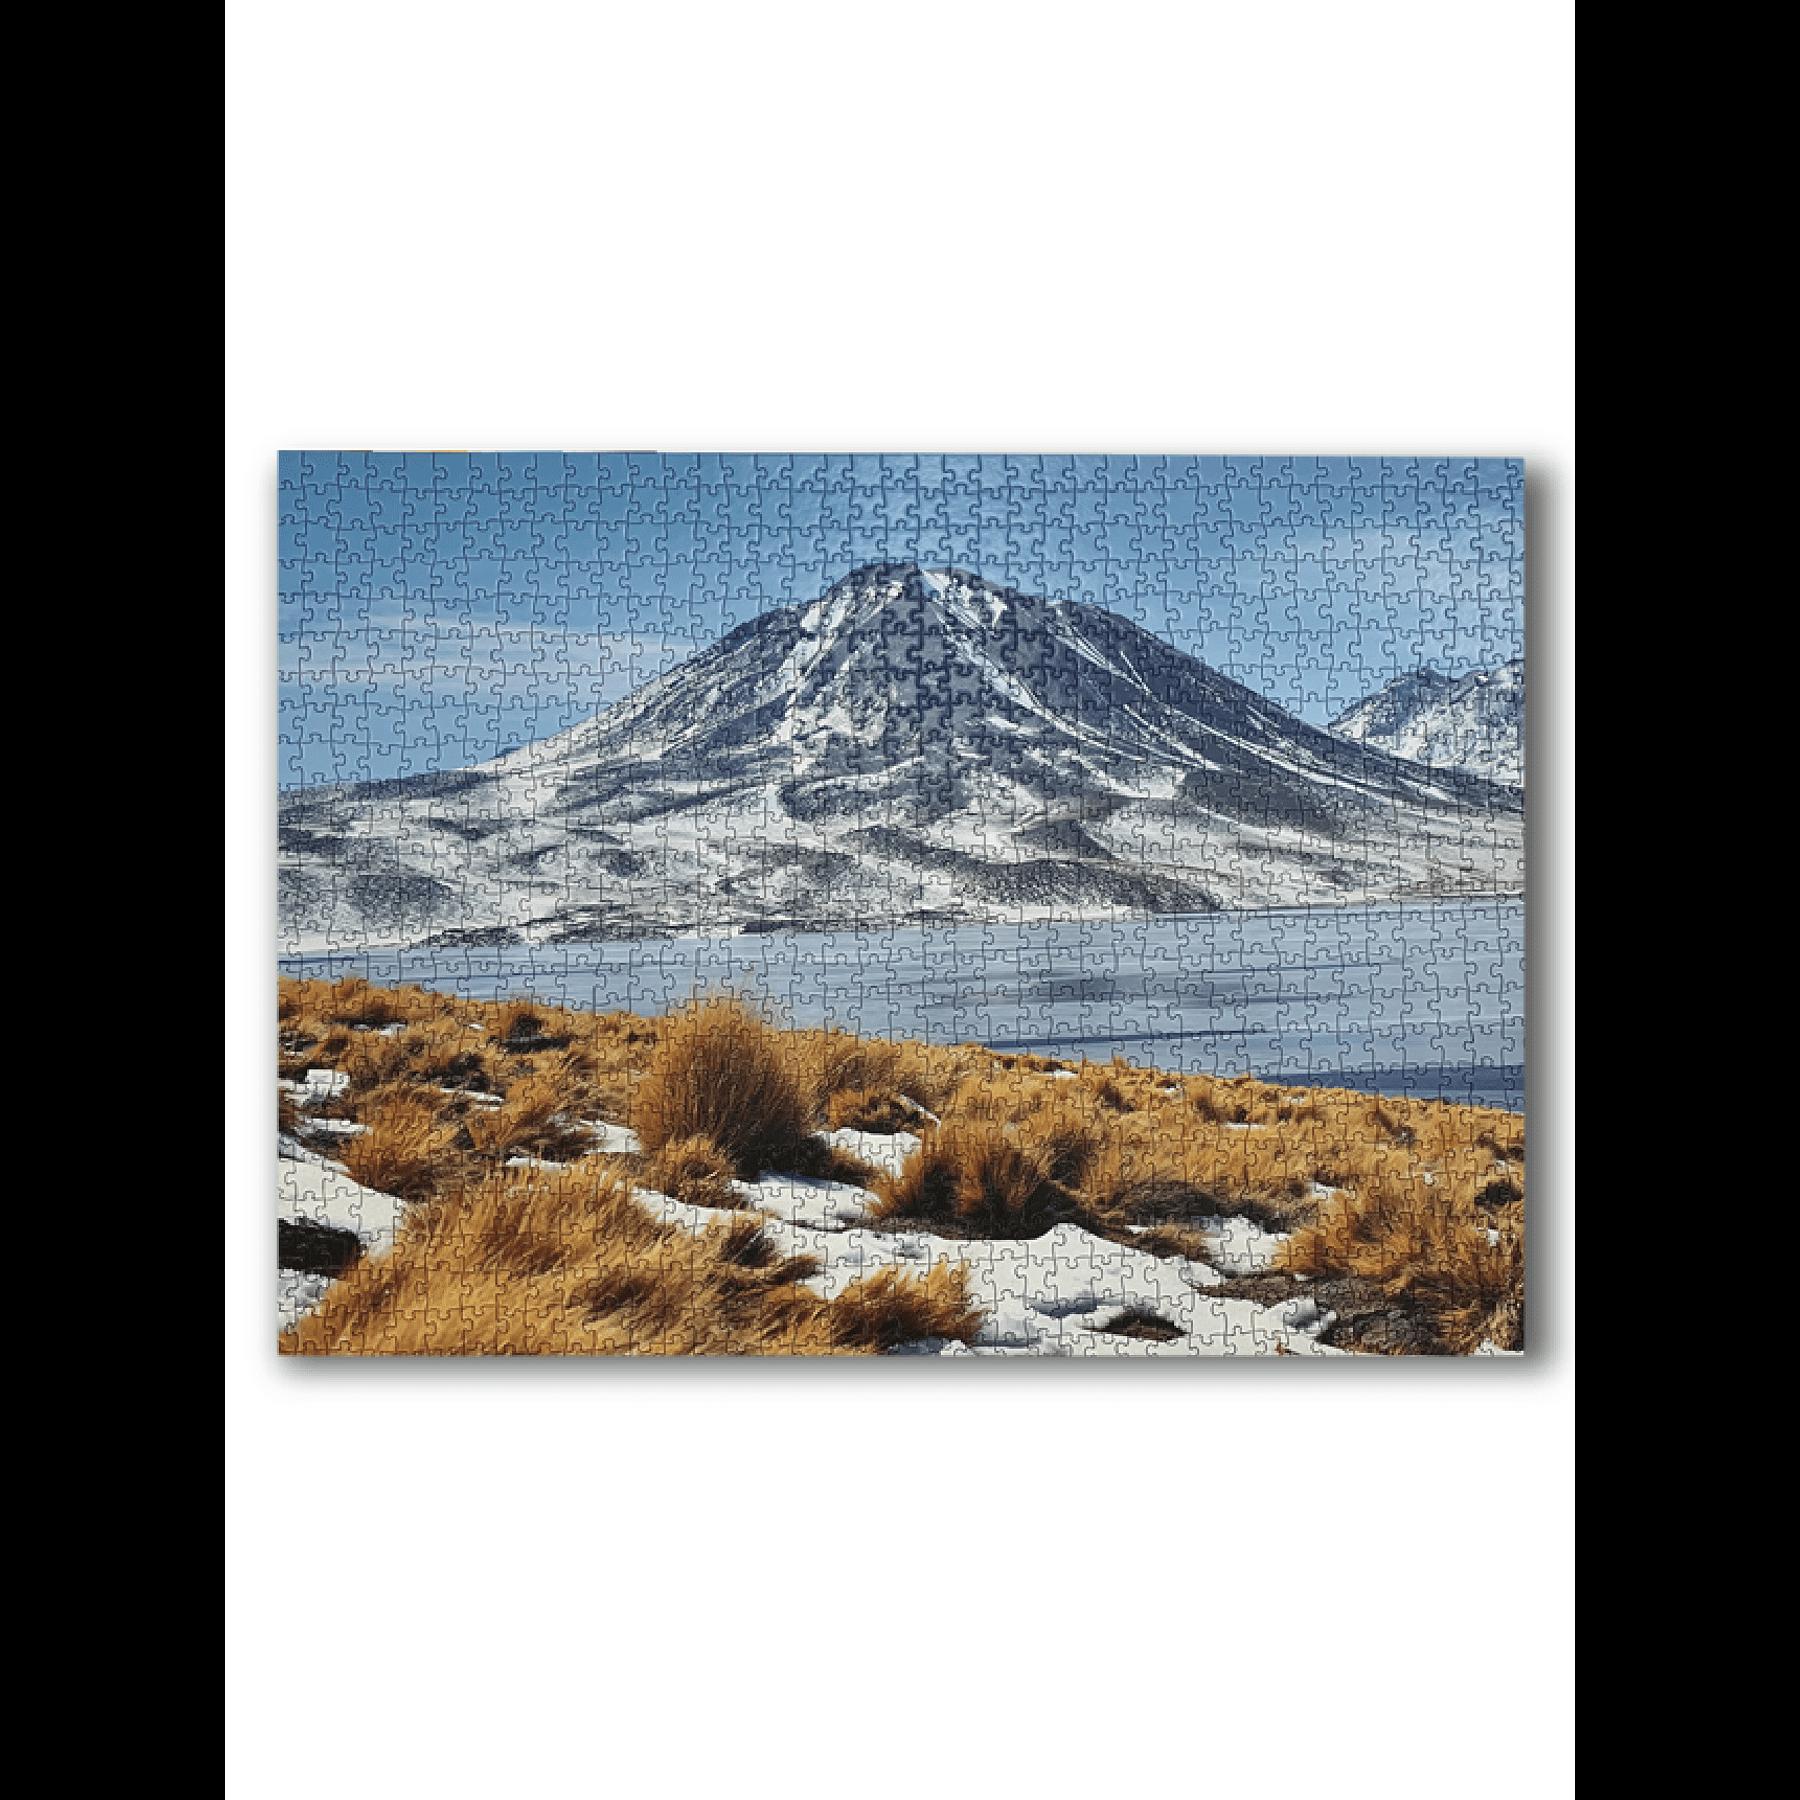 Puzzle Lagunas Altiplánicas 1000 Piezas